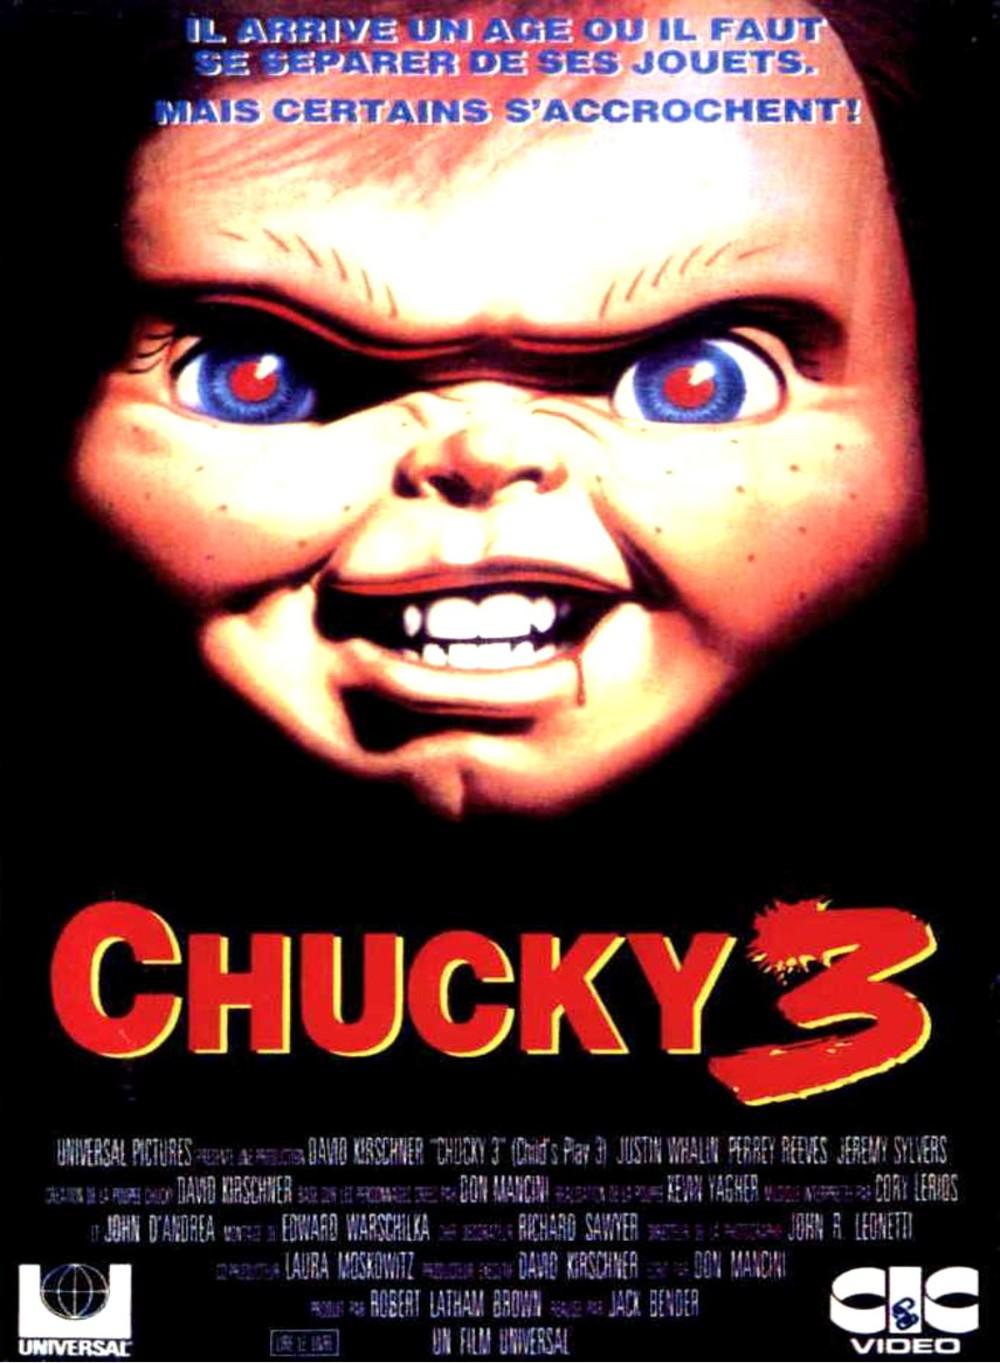 affiche du film Chucky 3